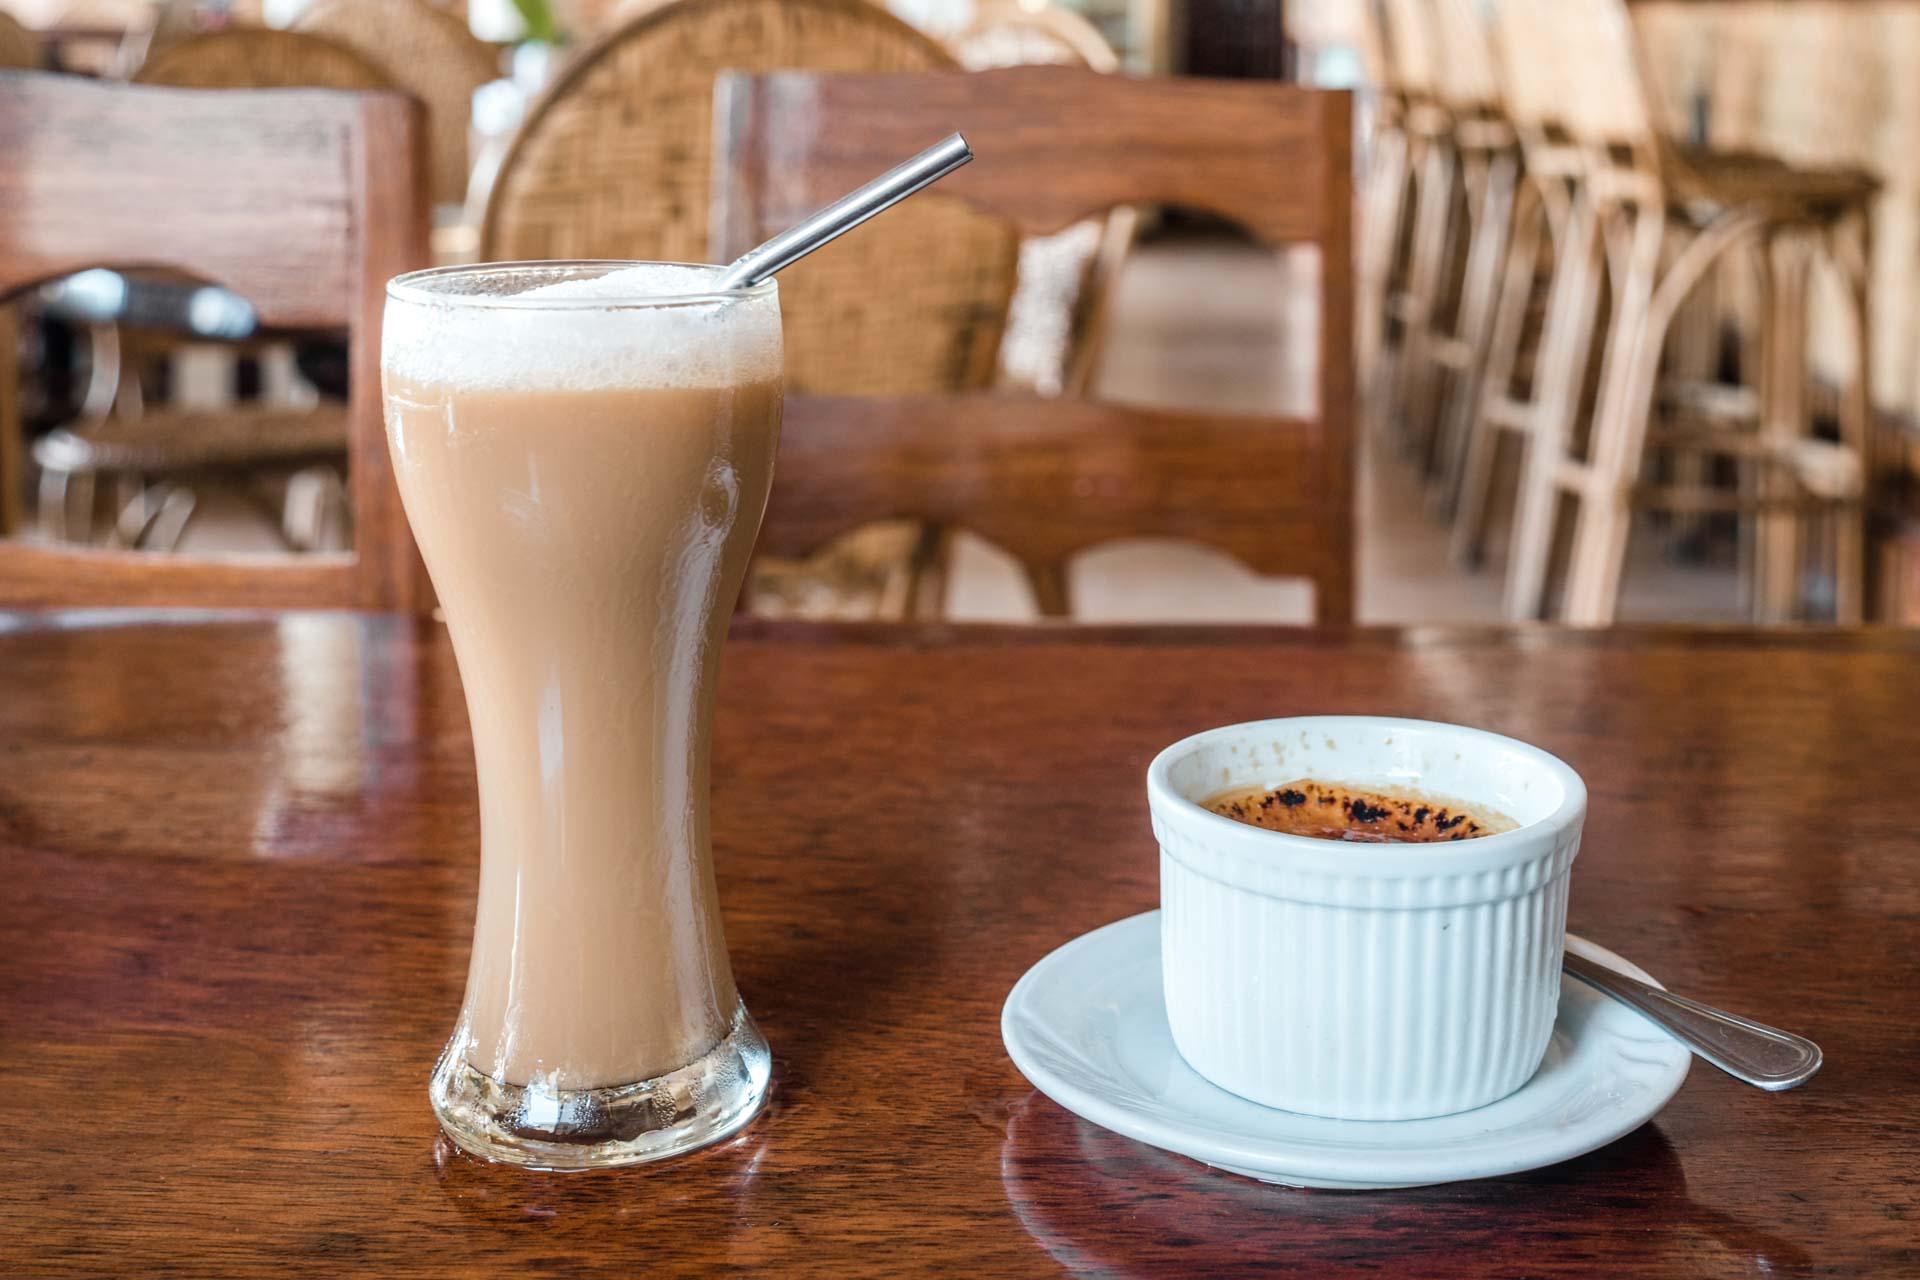 Coffee and dessert at Art Café